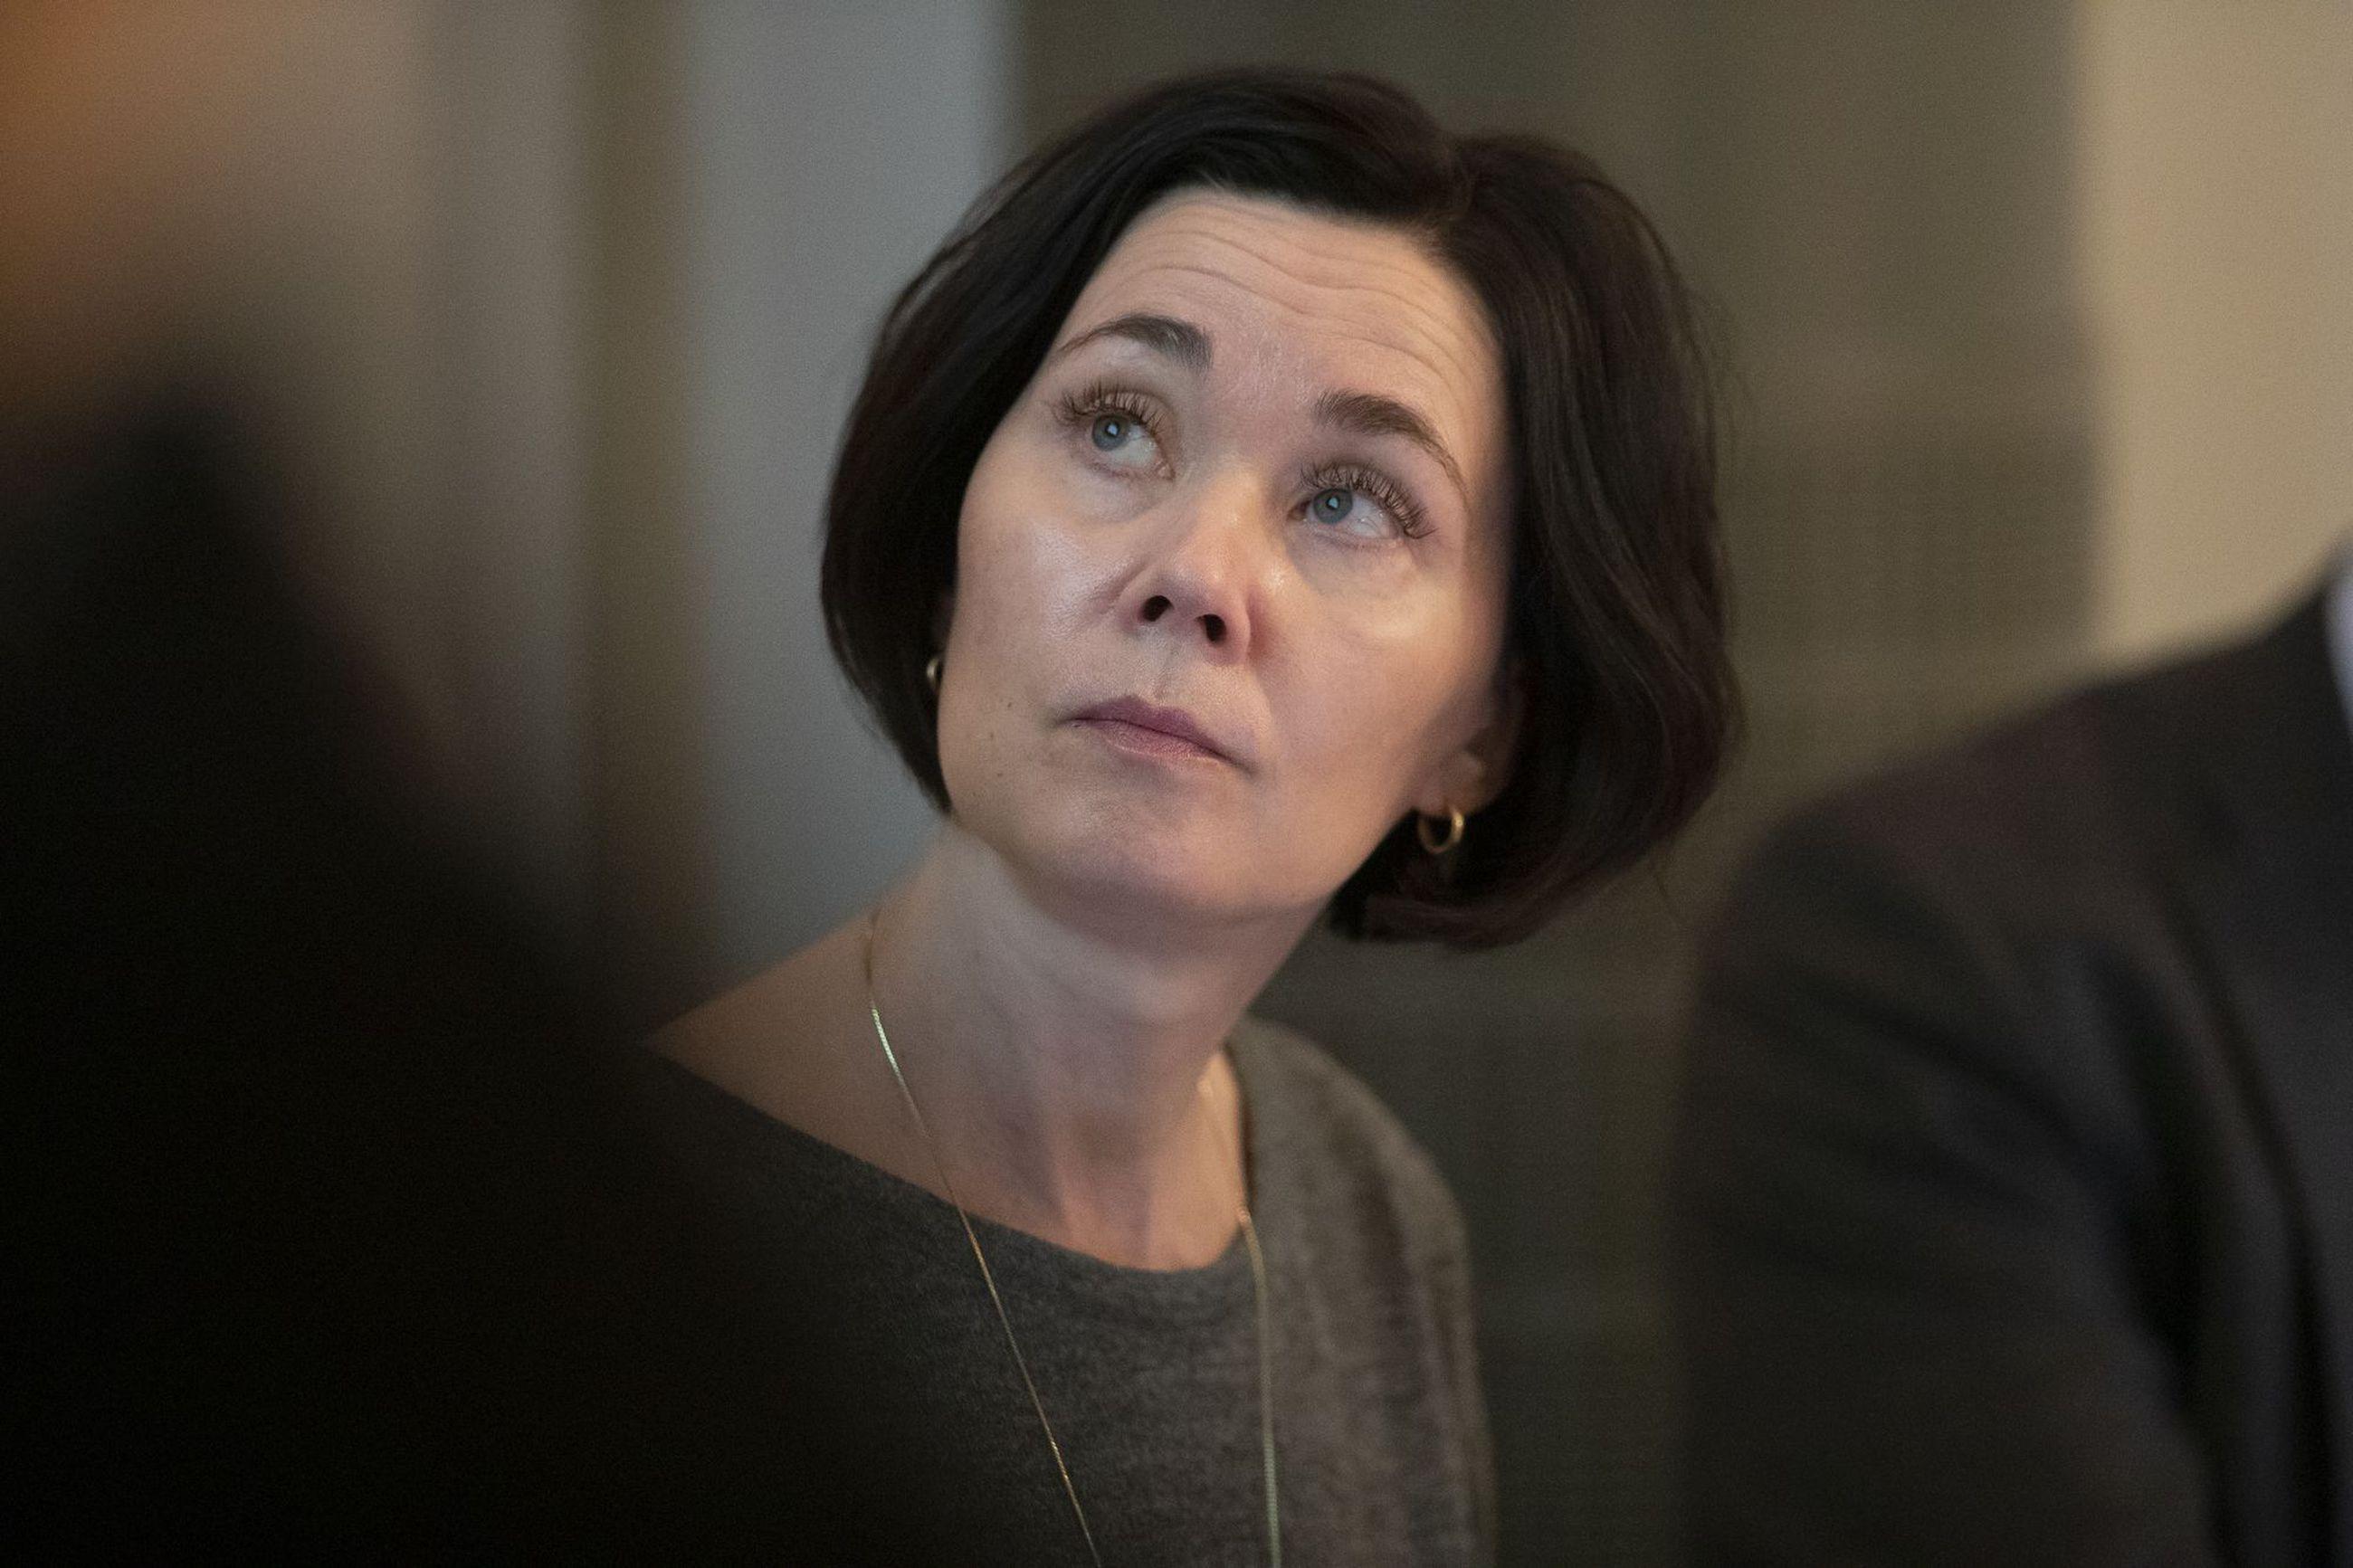 Hanna Leena Mattila